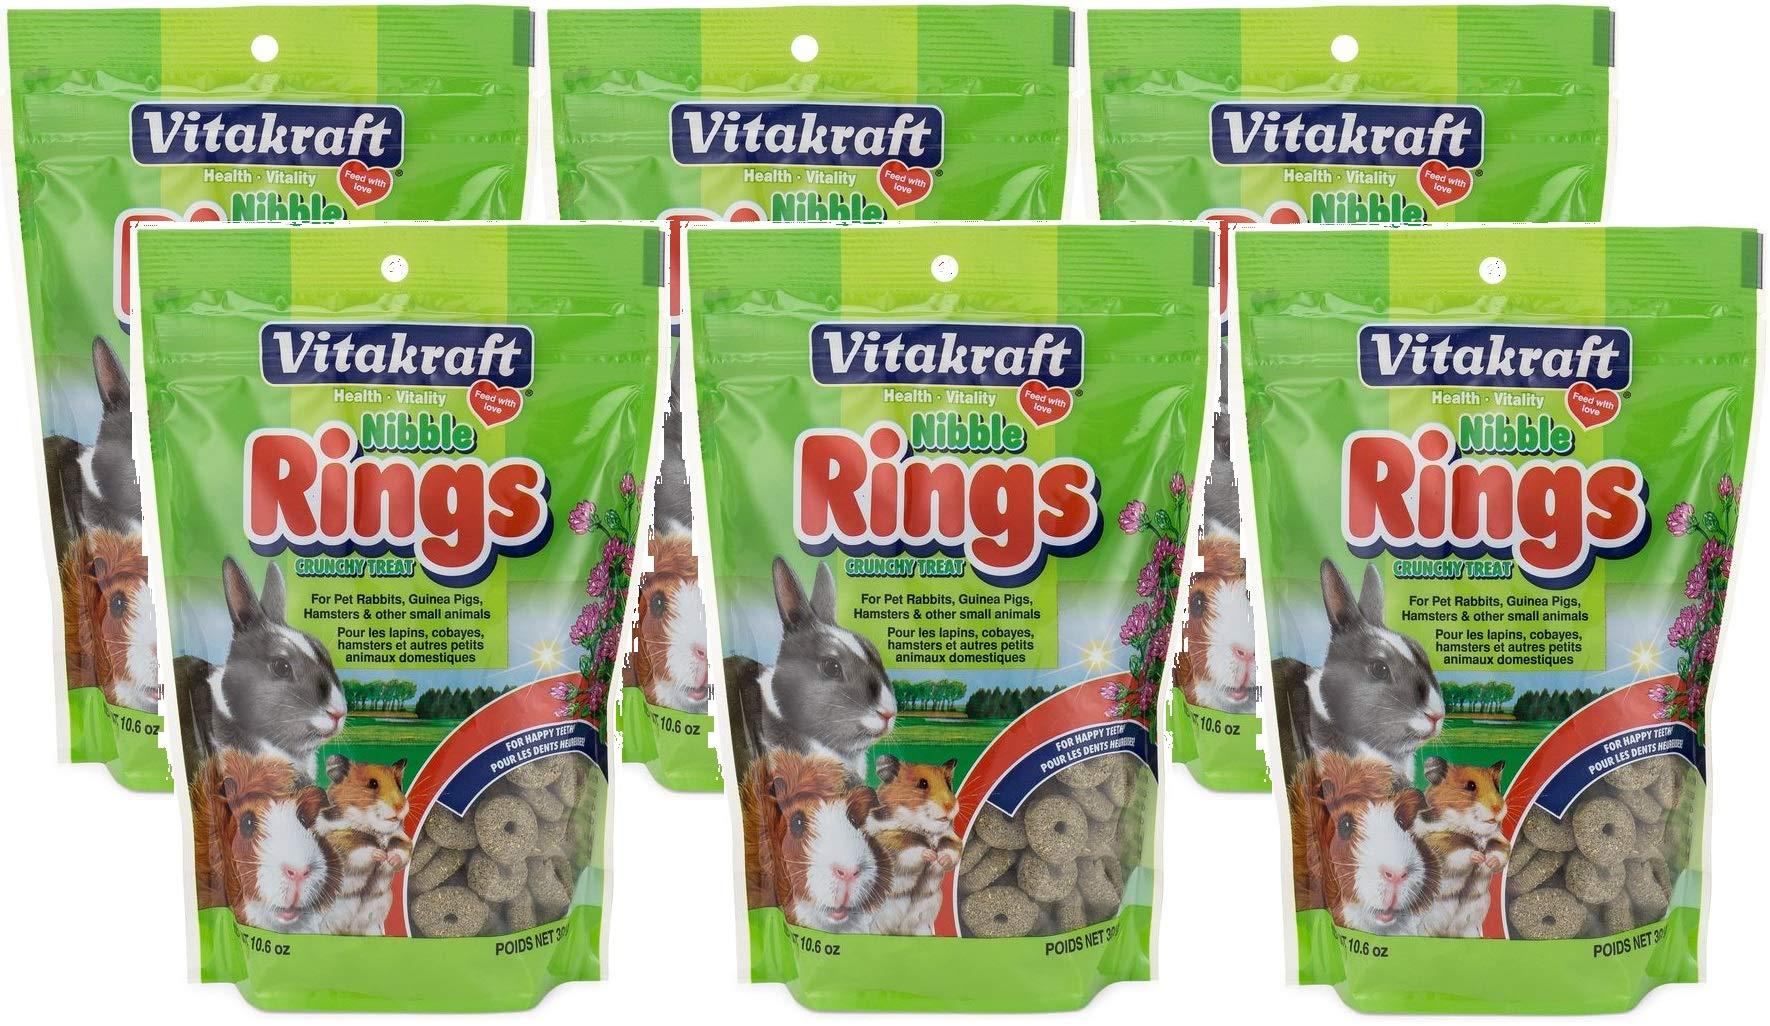 VitaKraft Small Animal Nibble Rings Crunchy Treat - 6 PACK